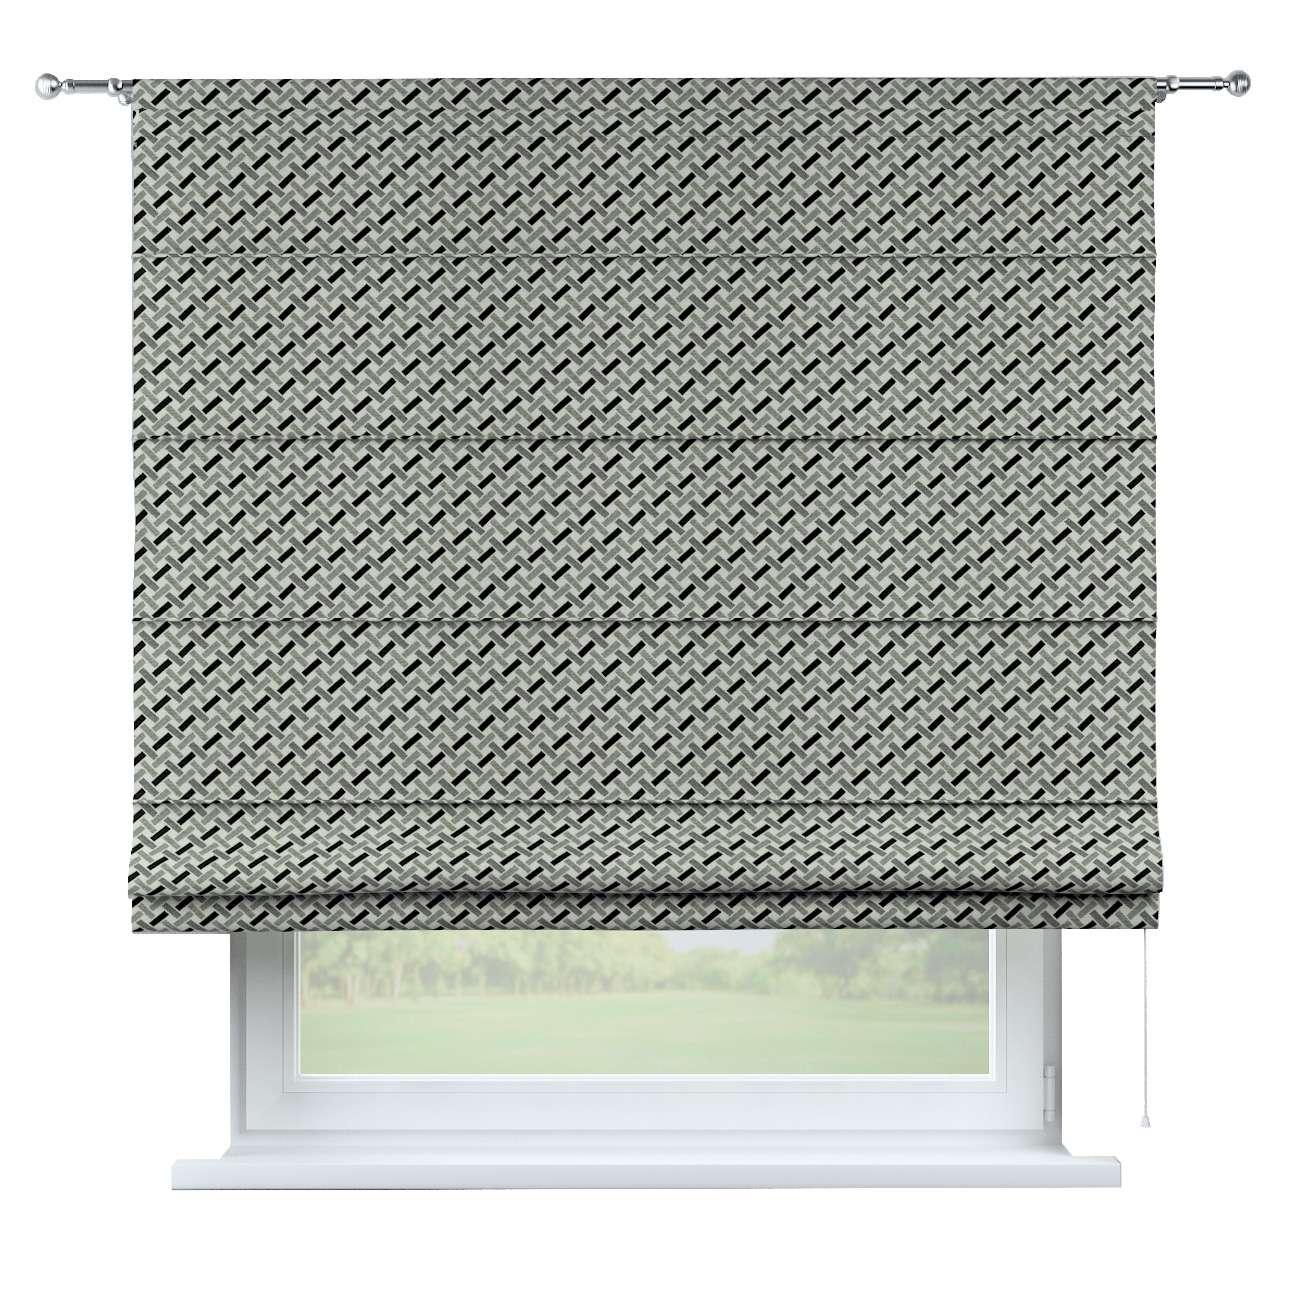 Roleta rzymska Torino 130×170cm w kolekcji Black & White, tkanina: 142-78